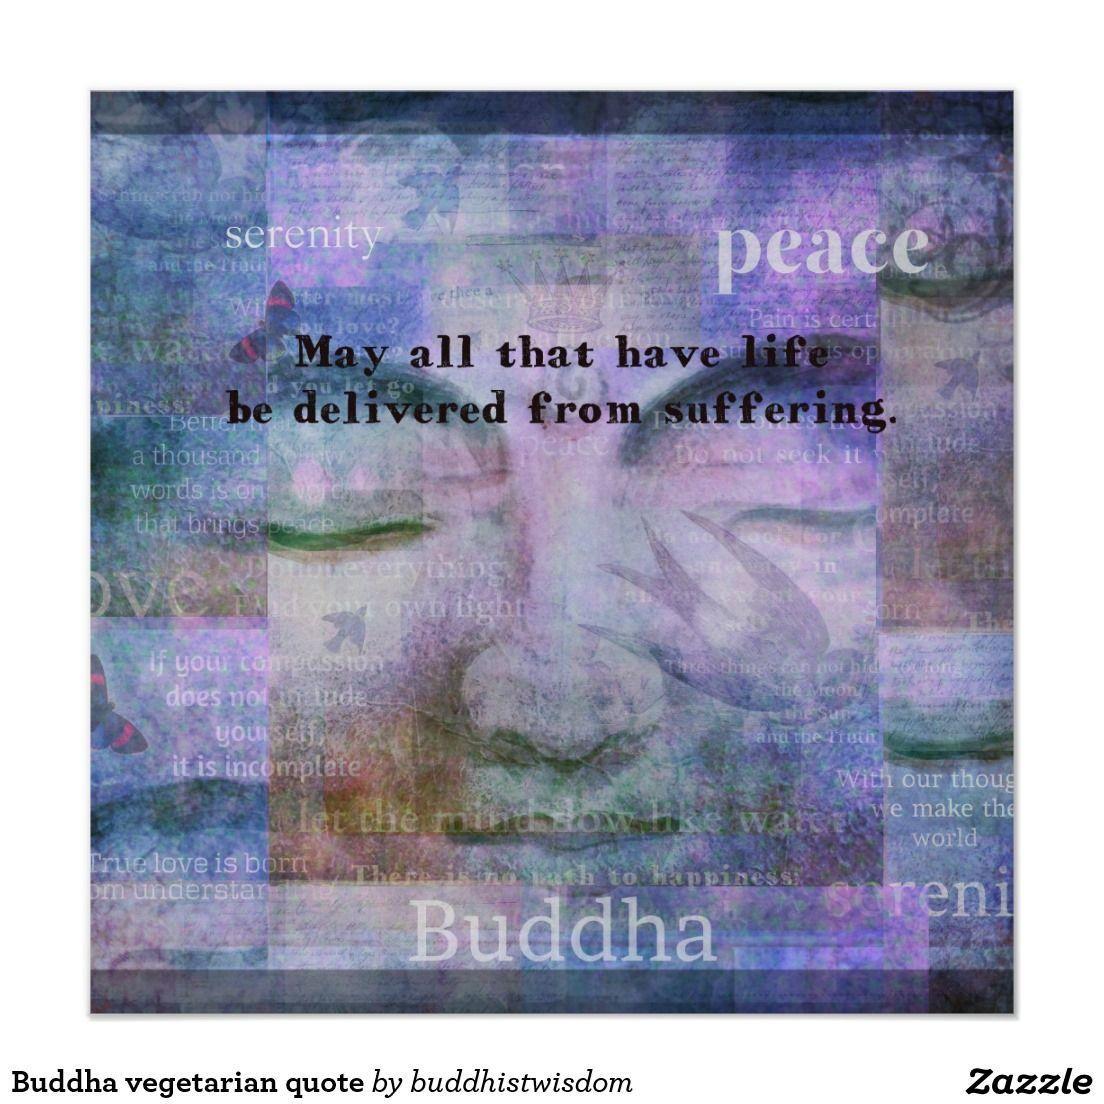 Buddha vegetarian quote poster | Zazzle.com #vegetarianquotes Buddha vegetarian quote poster #vegetarianquotes Buddha vegetarian quote poster | Zazzle.com #vegetarianquotes Buddha vegetarian quote poster #vegetarianquotes